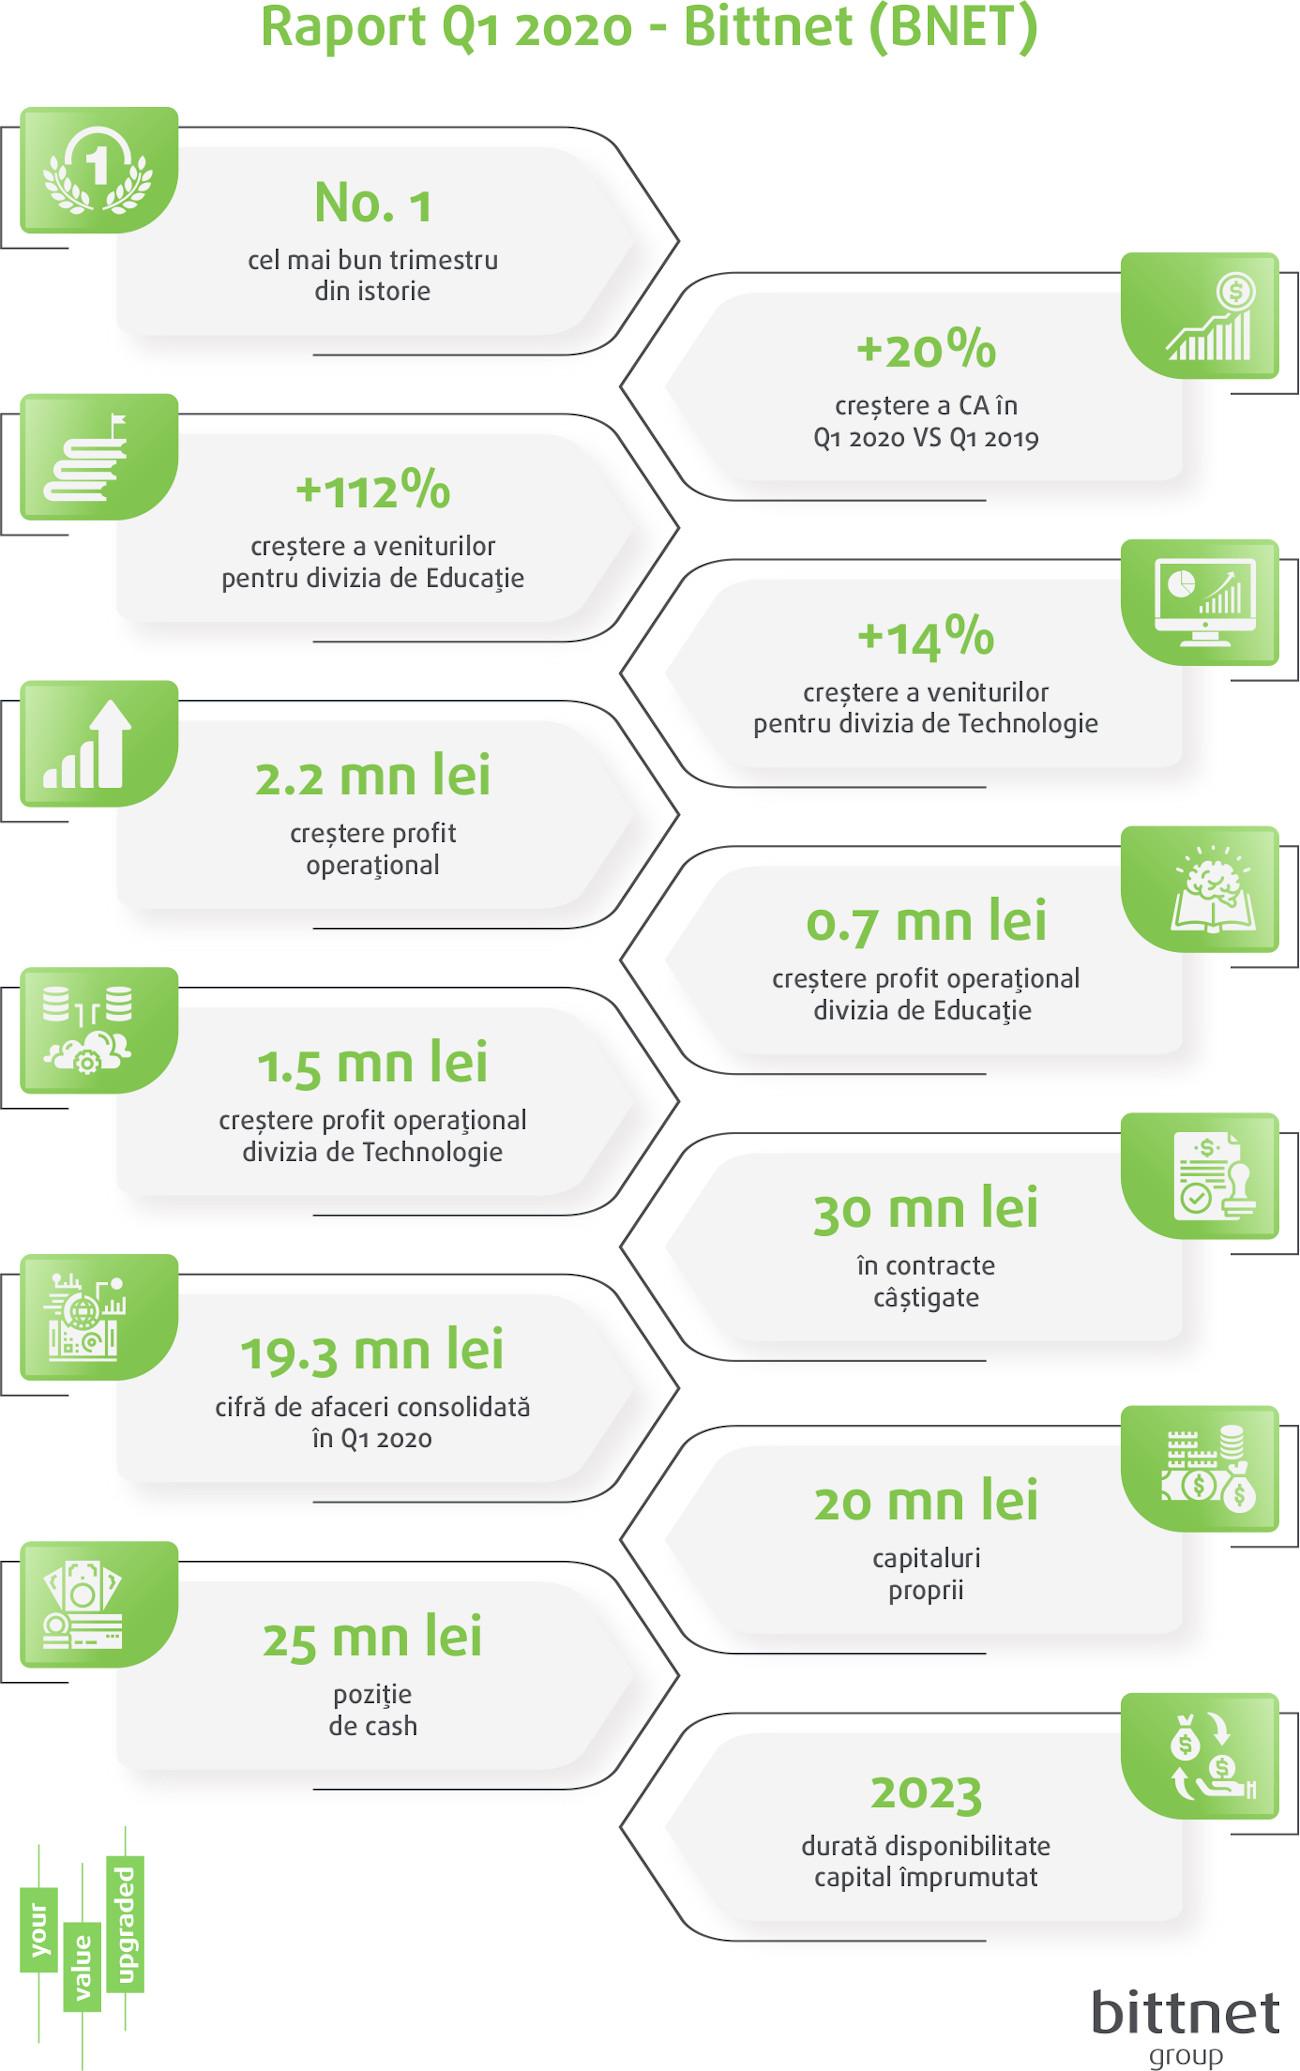 BNET Infographic Raport Q1 2020